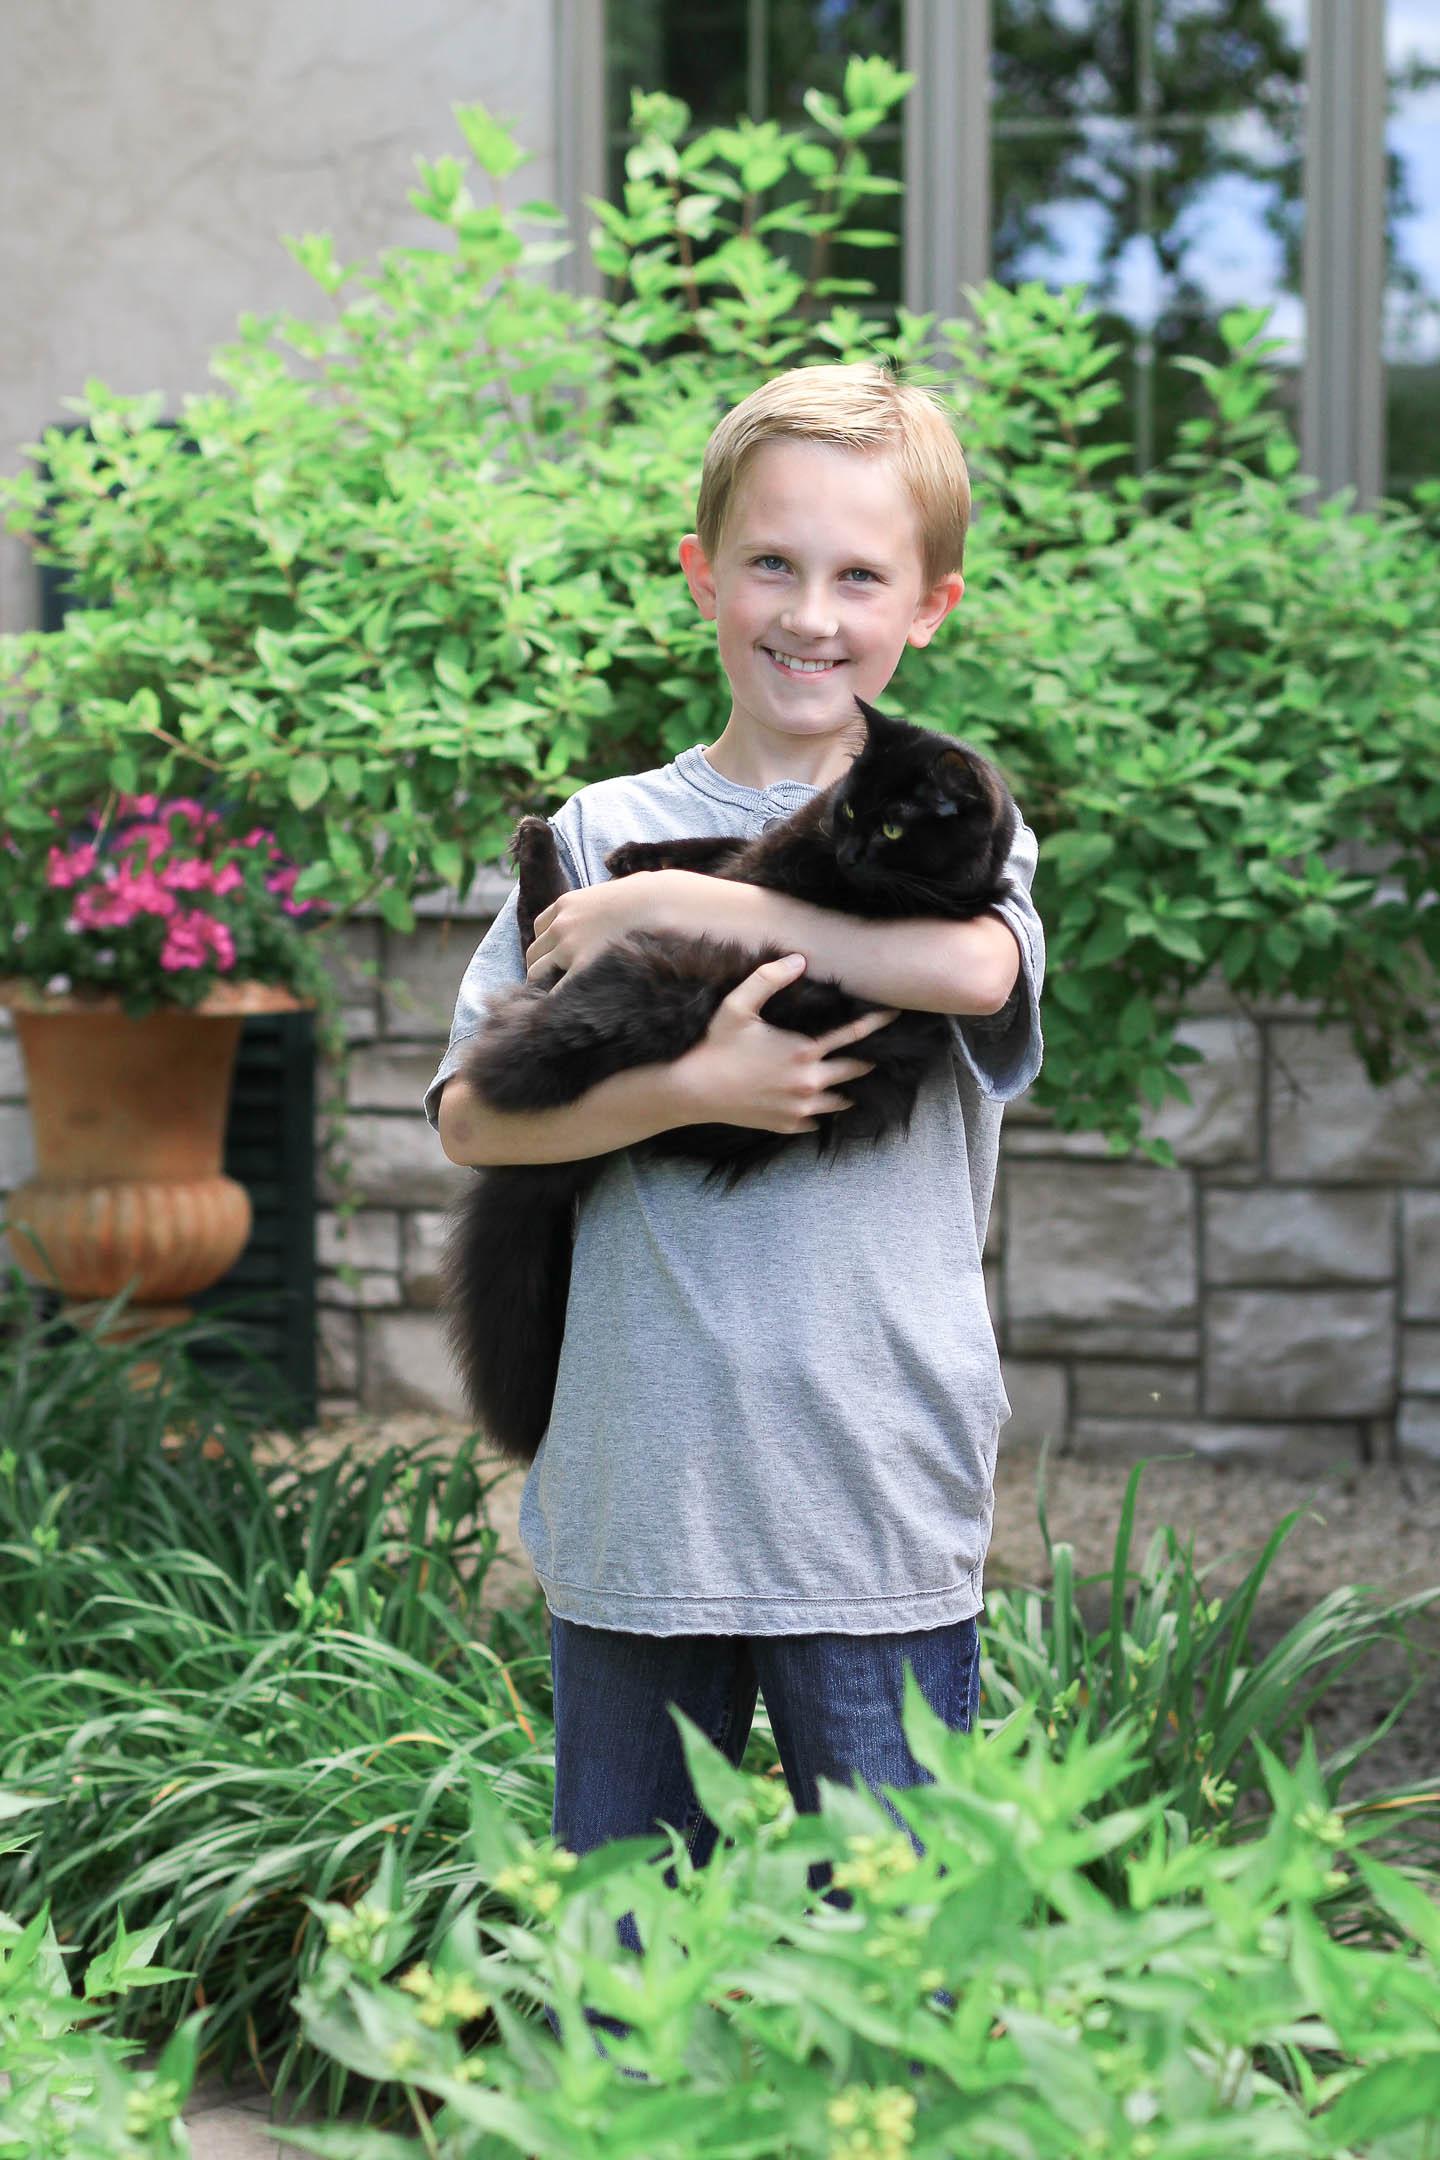 A boy holding a black cat